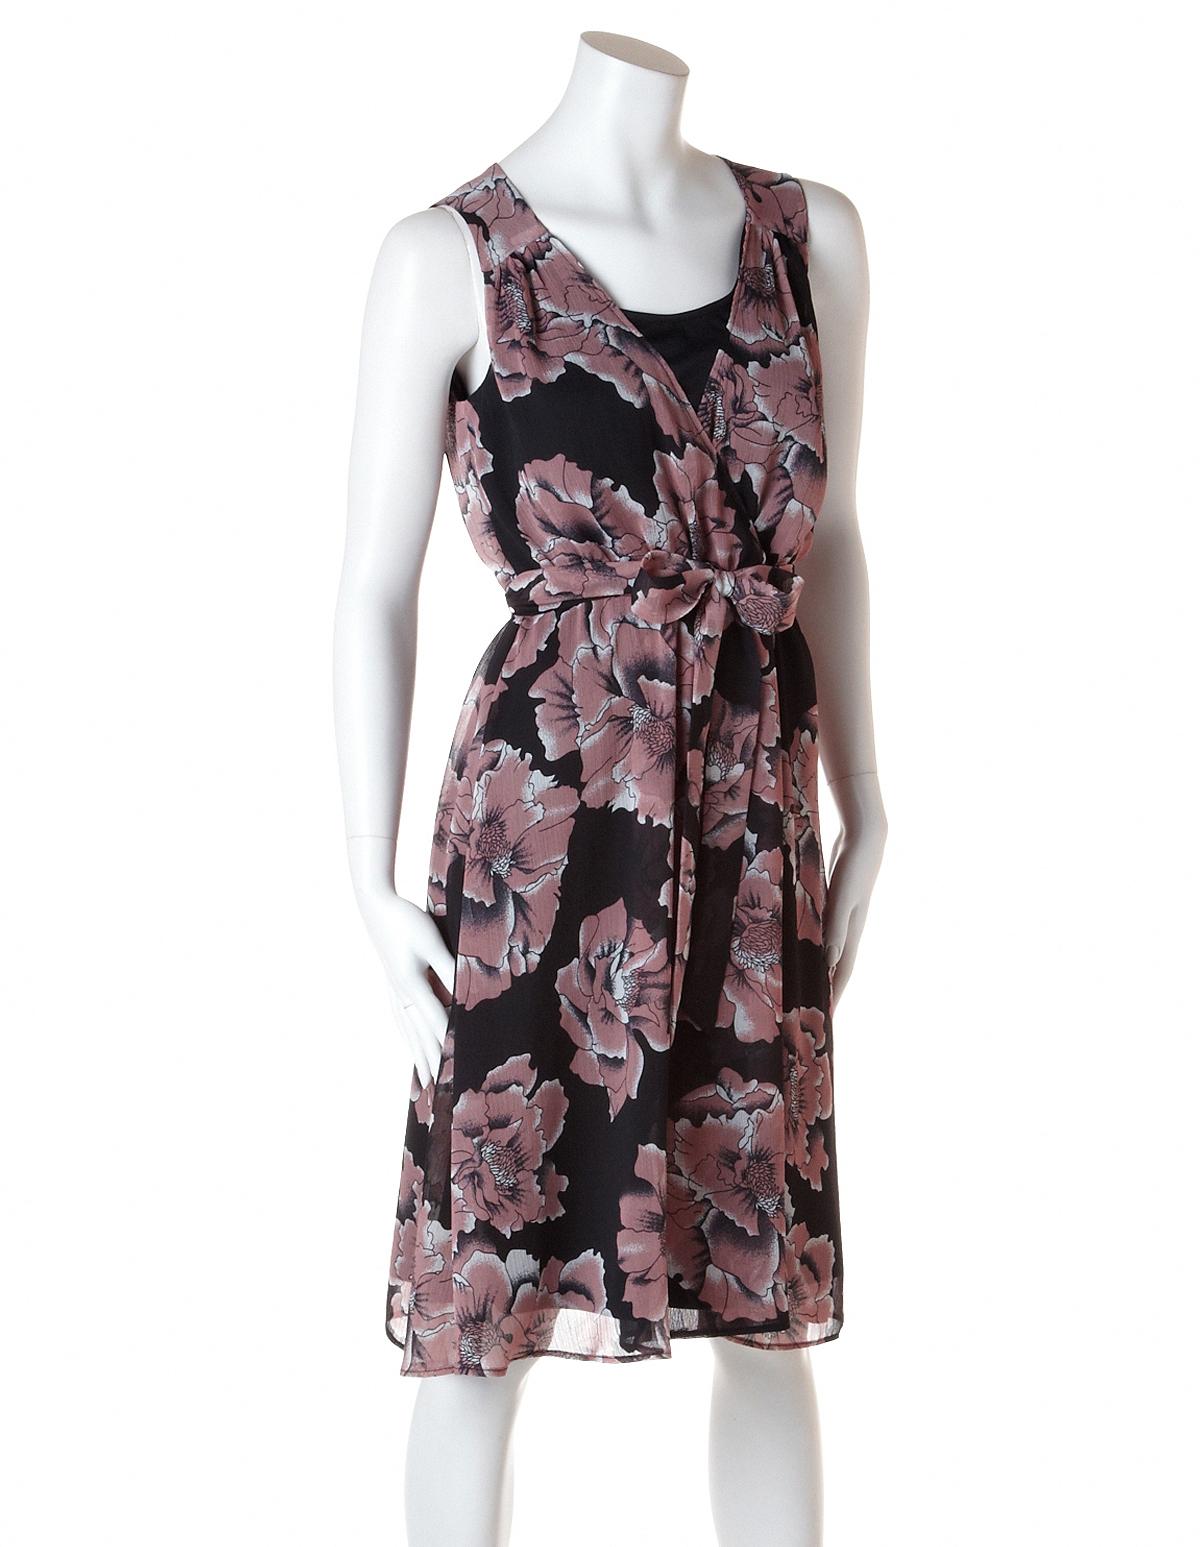 7855c7d4cd982 ... Blush Floral Fit and Flare Dress, Blush/Black/Ivory, hi-res ...